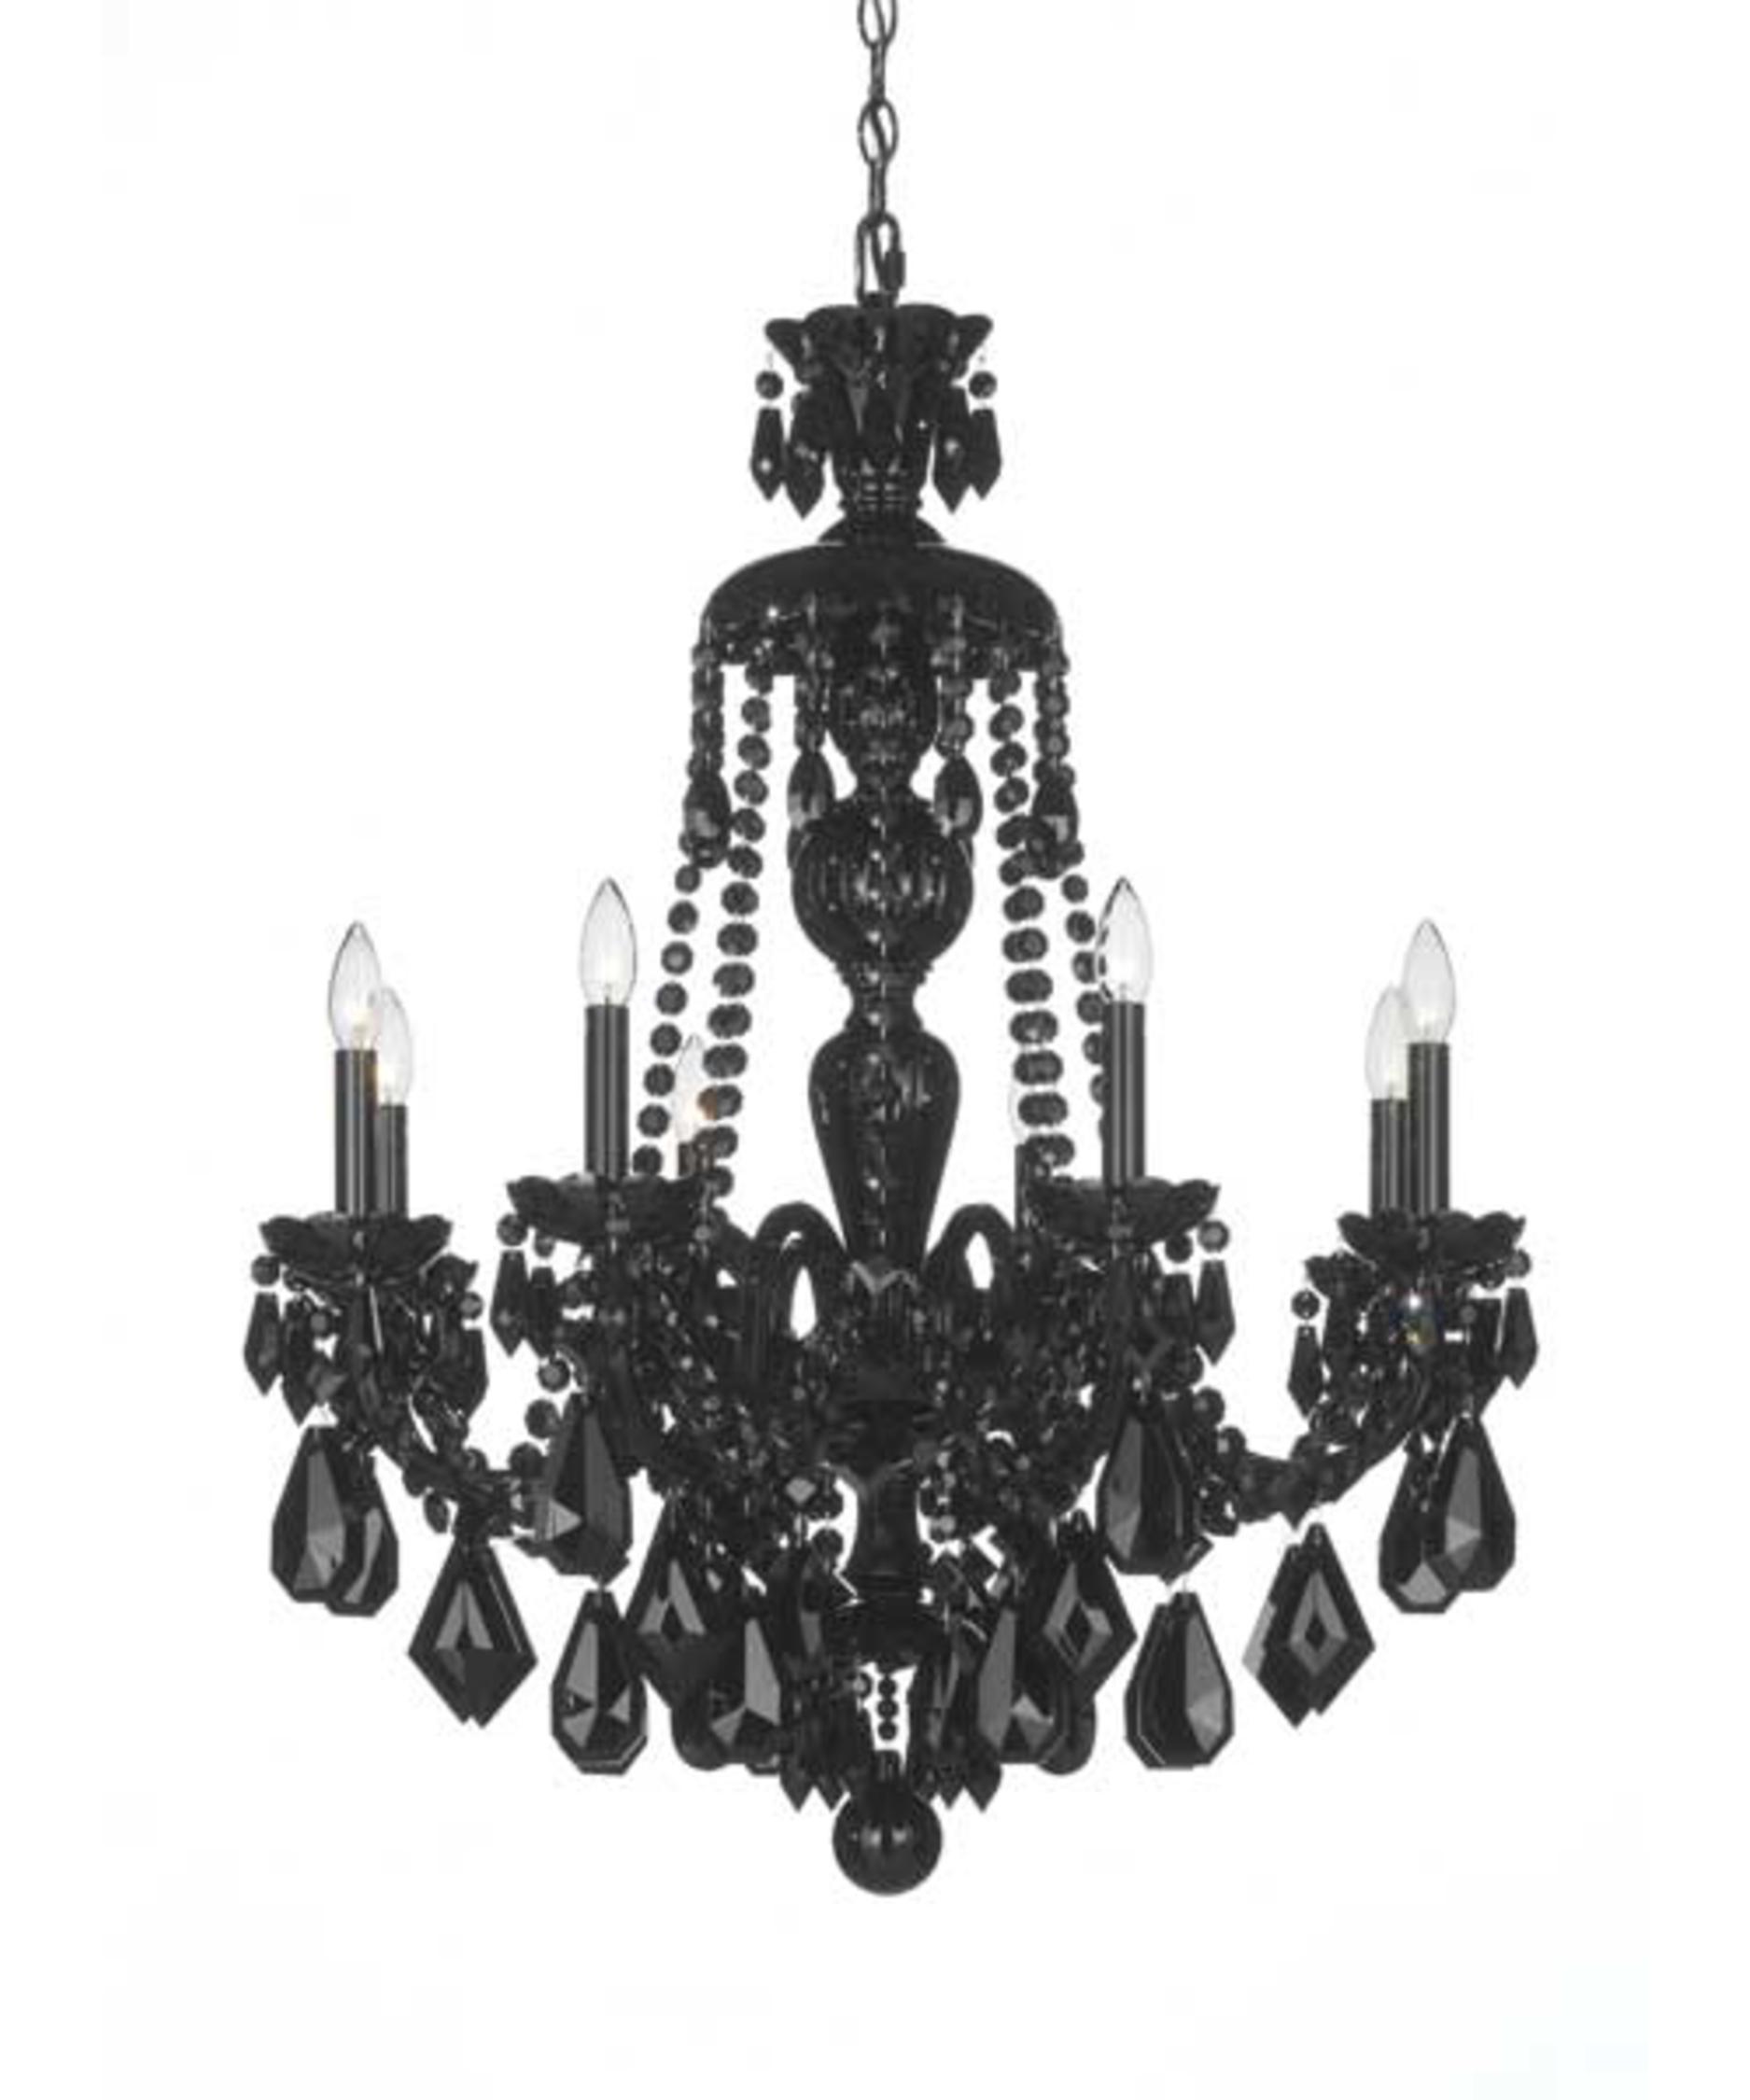 Schonbek 5737BK Hamilton Black 28 Inch Wide 8 Light Chandelier